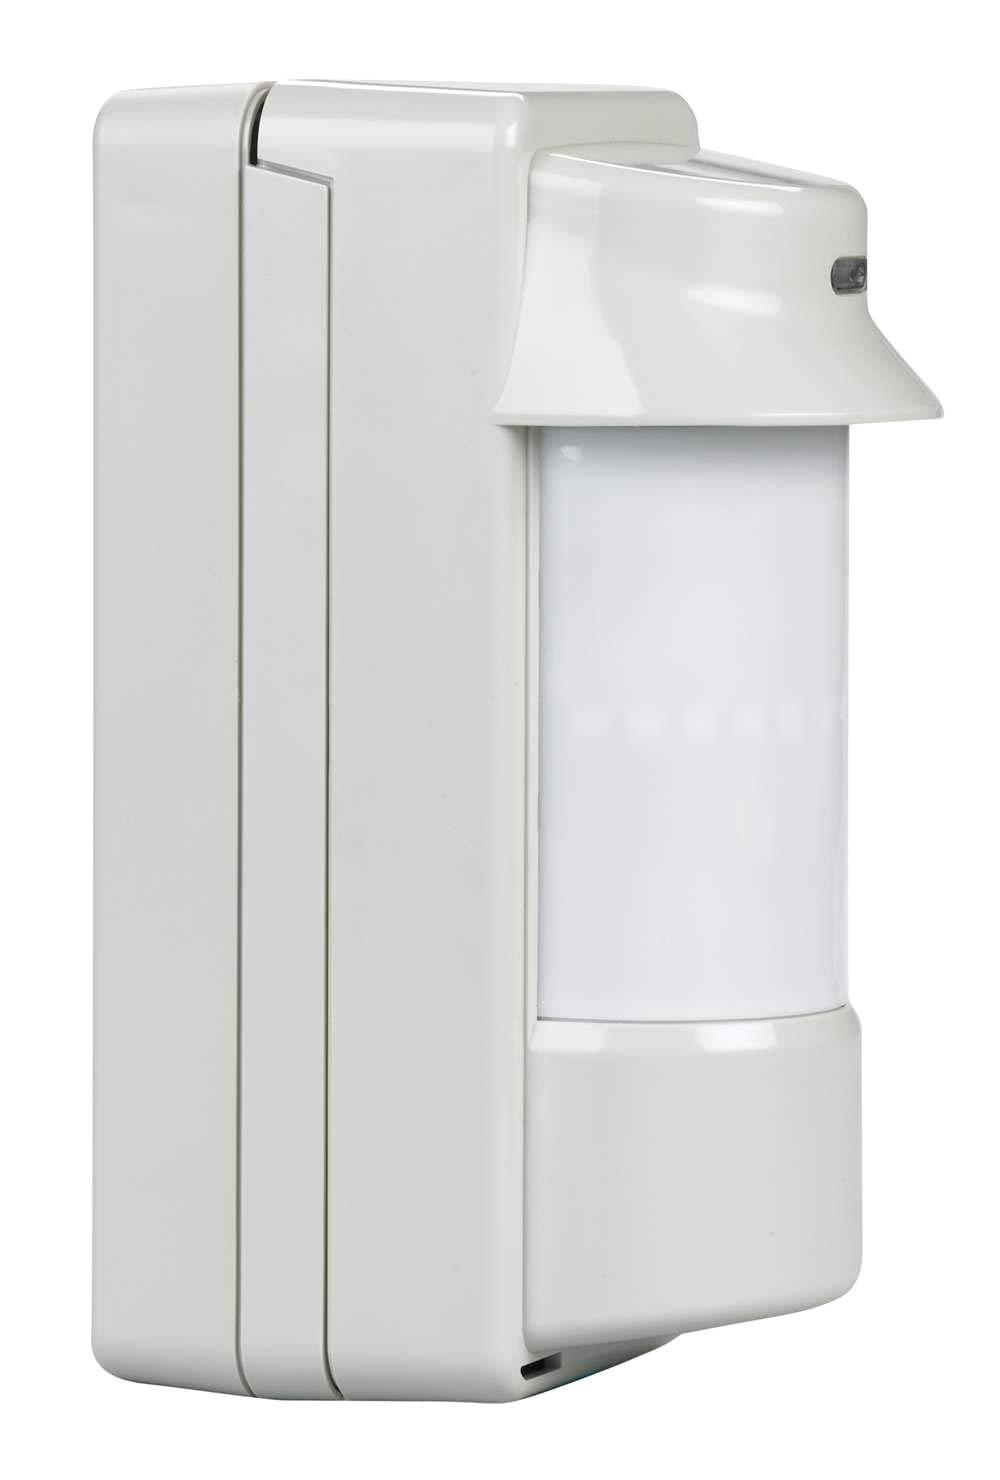 amazon com ademco 5800pir od honeywell 5800pir od motion detector camera photo